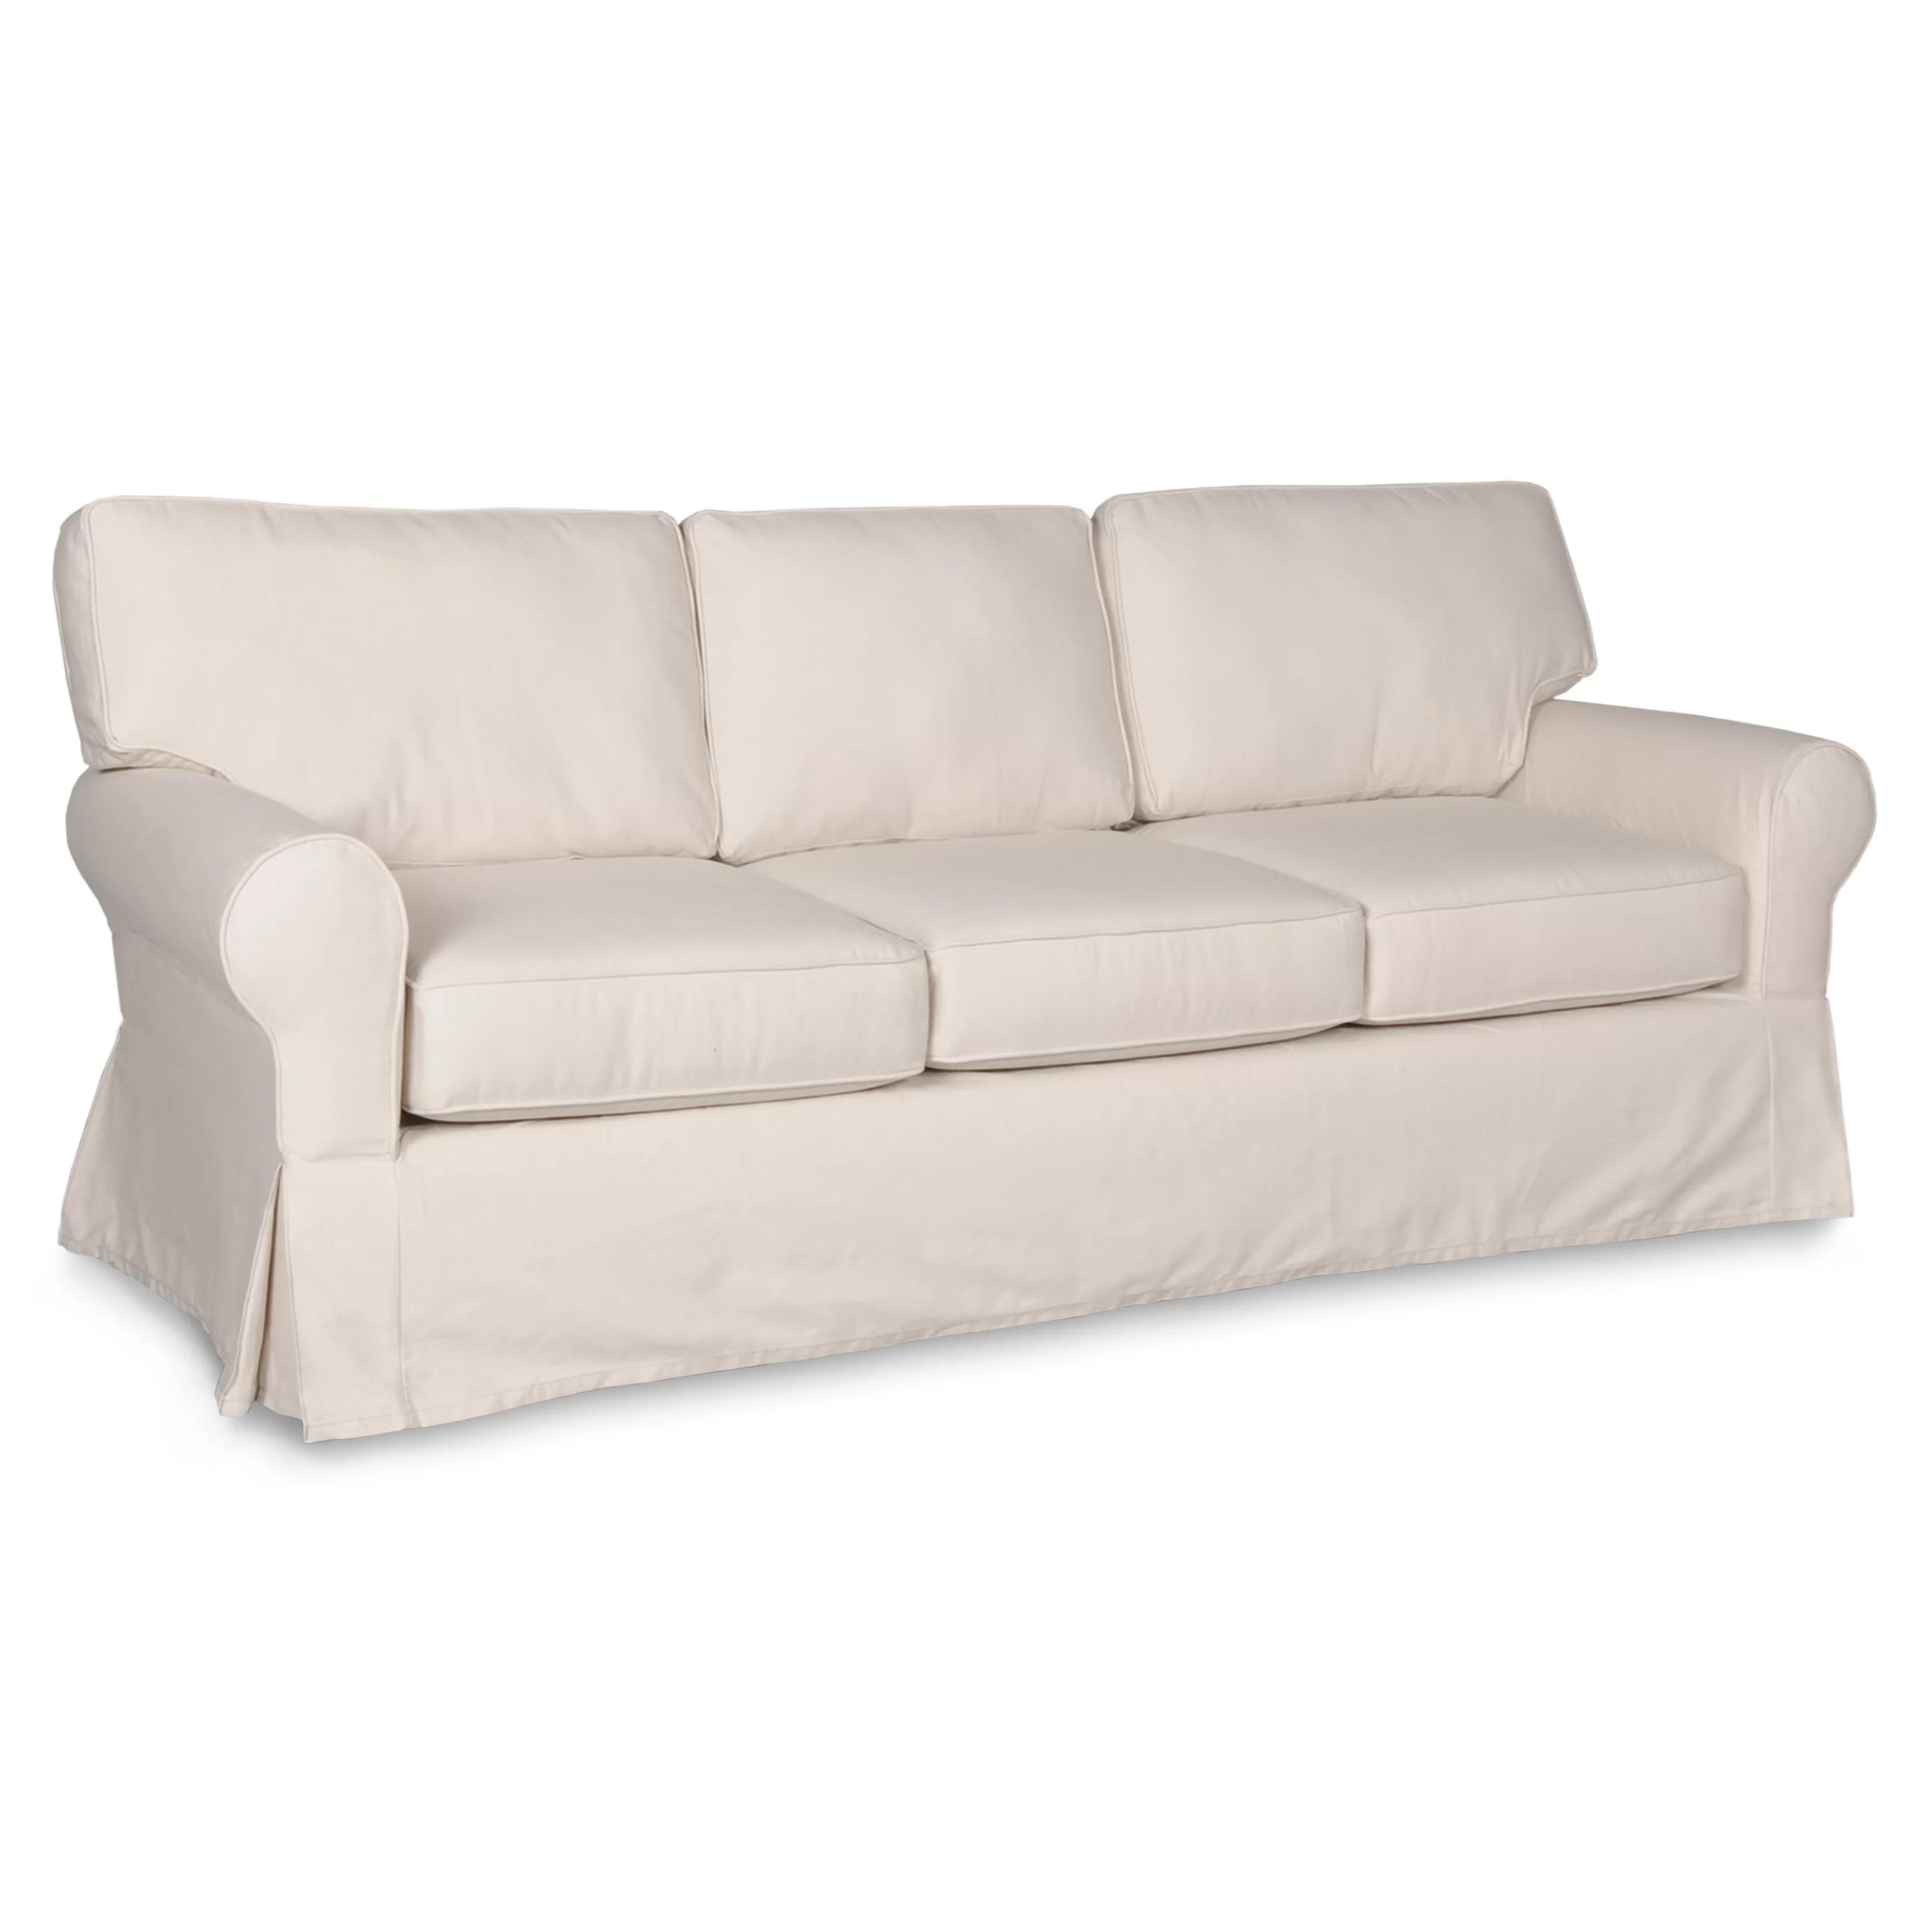 Slipcover Sofa Xl